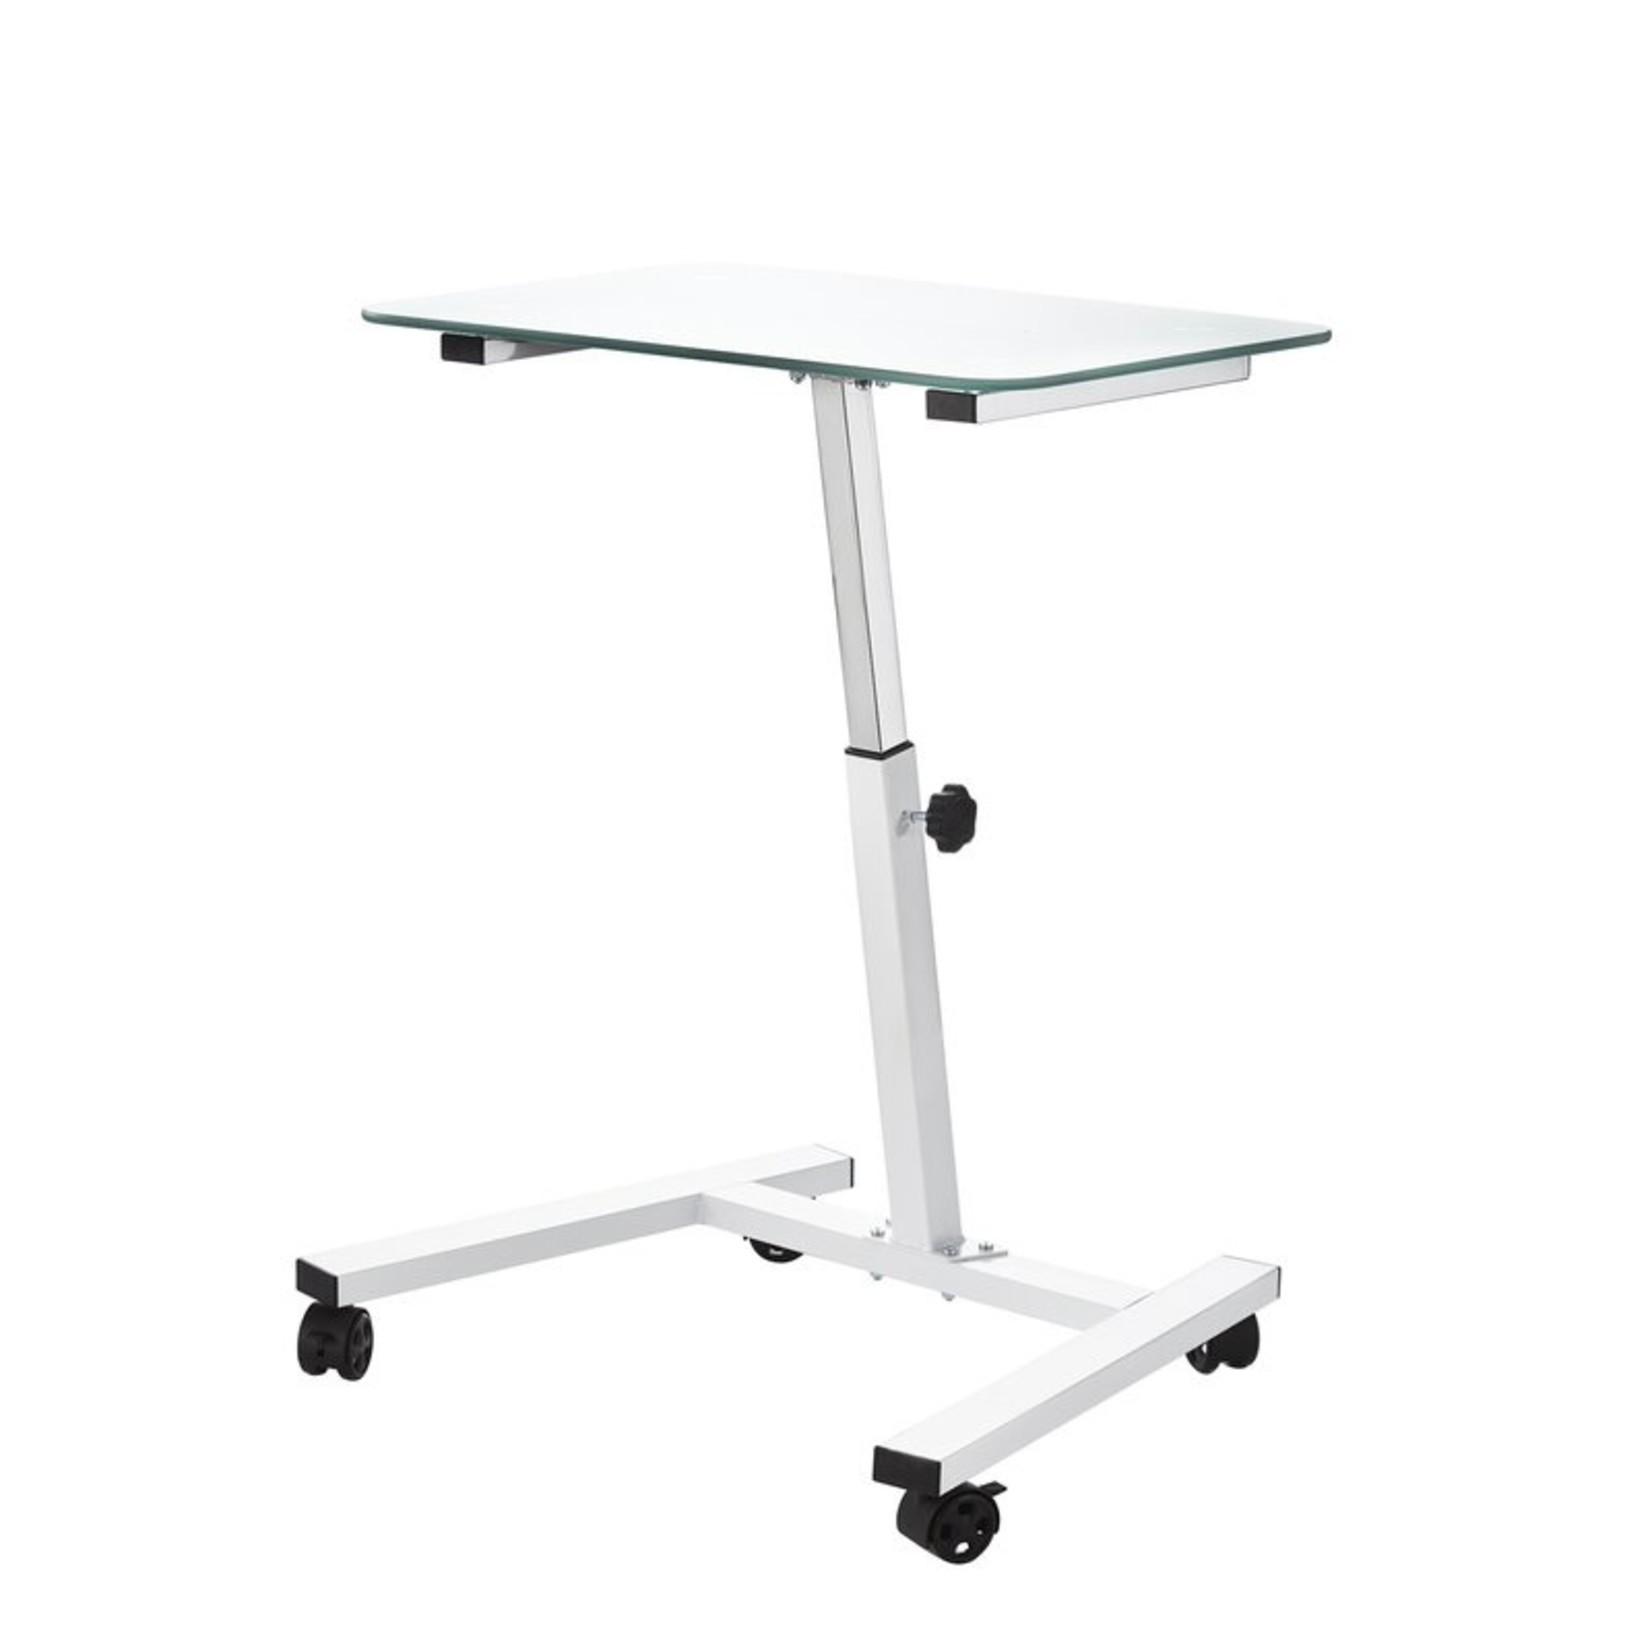 "*Seville Classics Airlift 23.6"" Tempered Glass Height Adjustable Mobile Laptop Desk Cart - White"